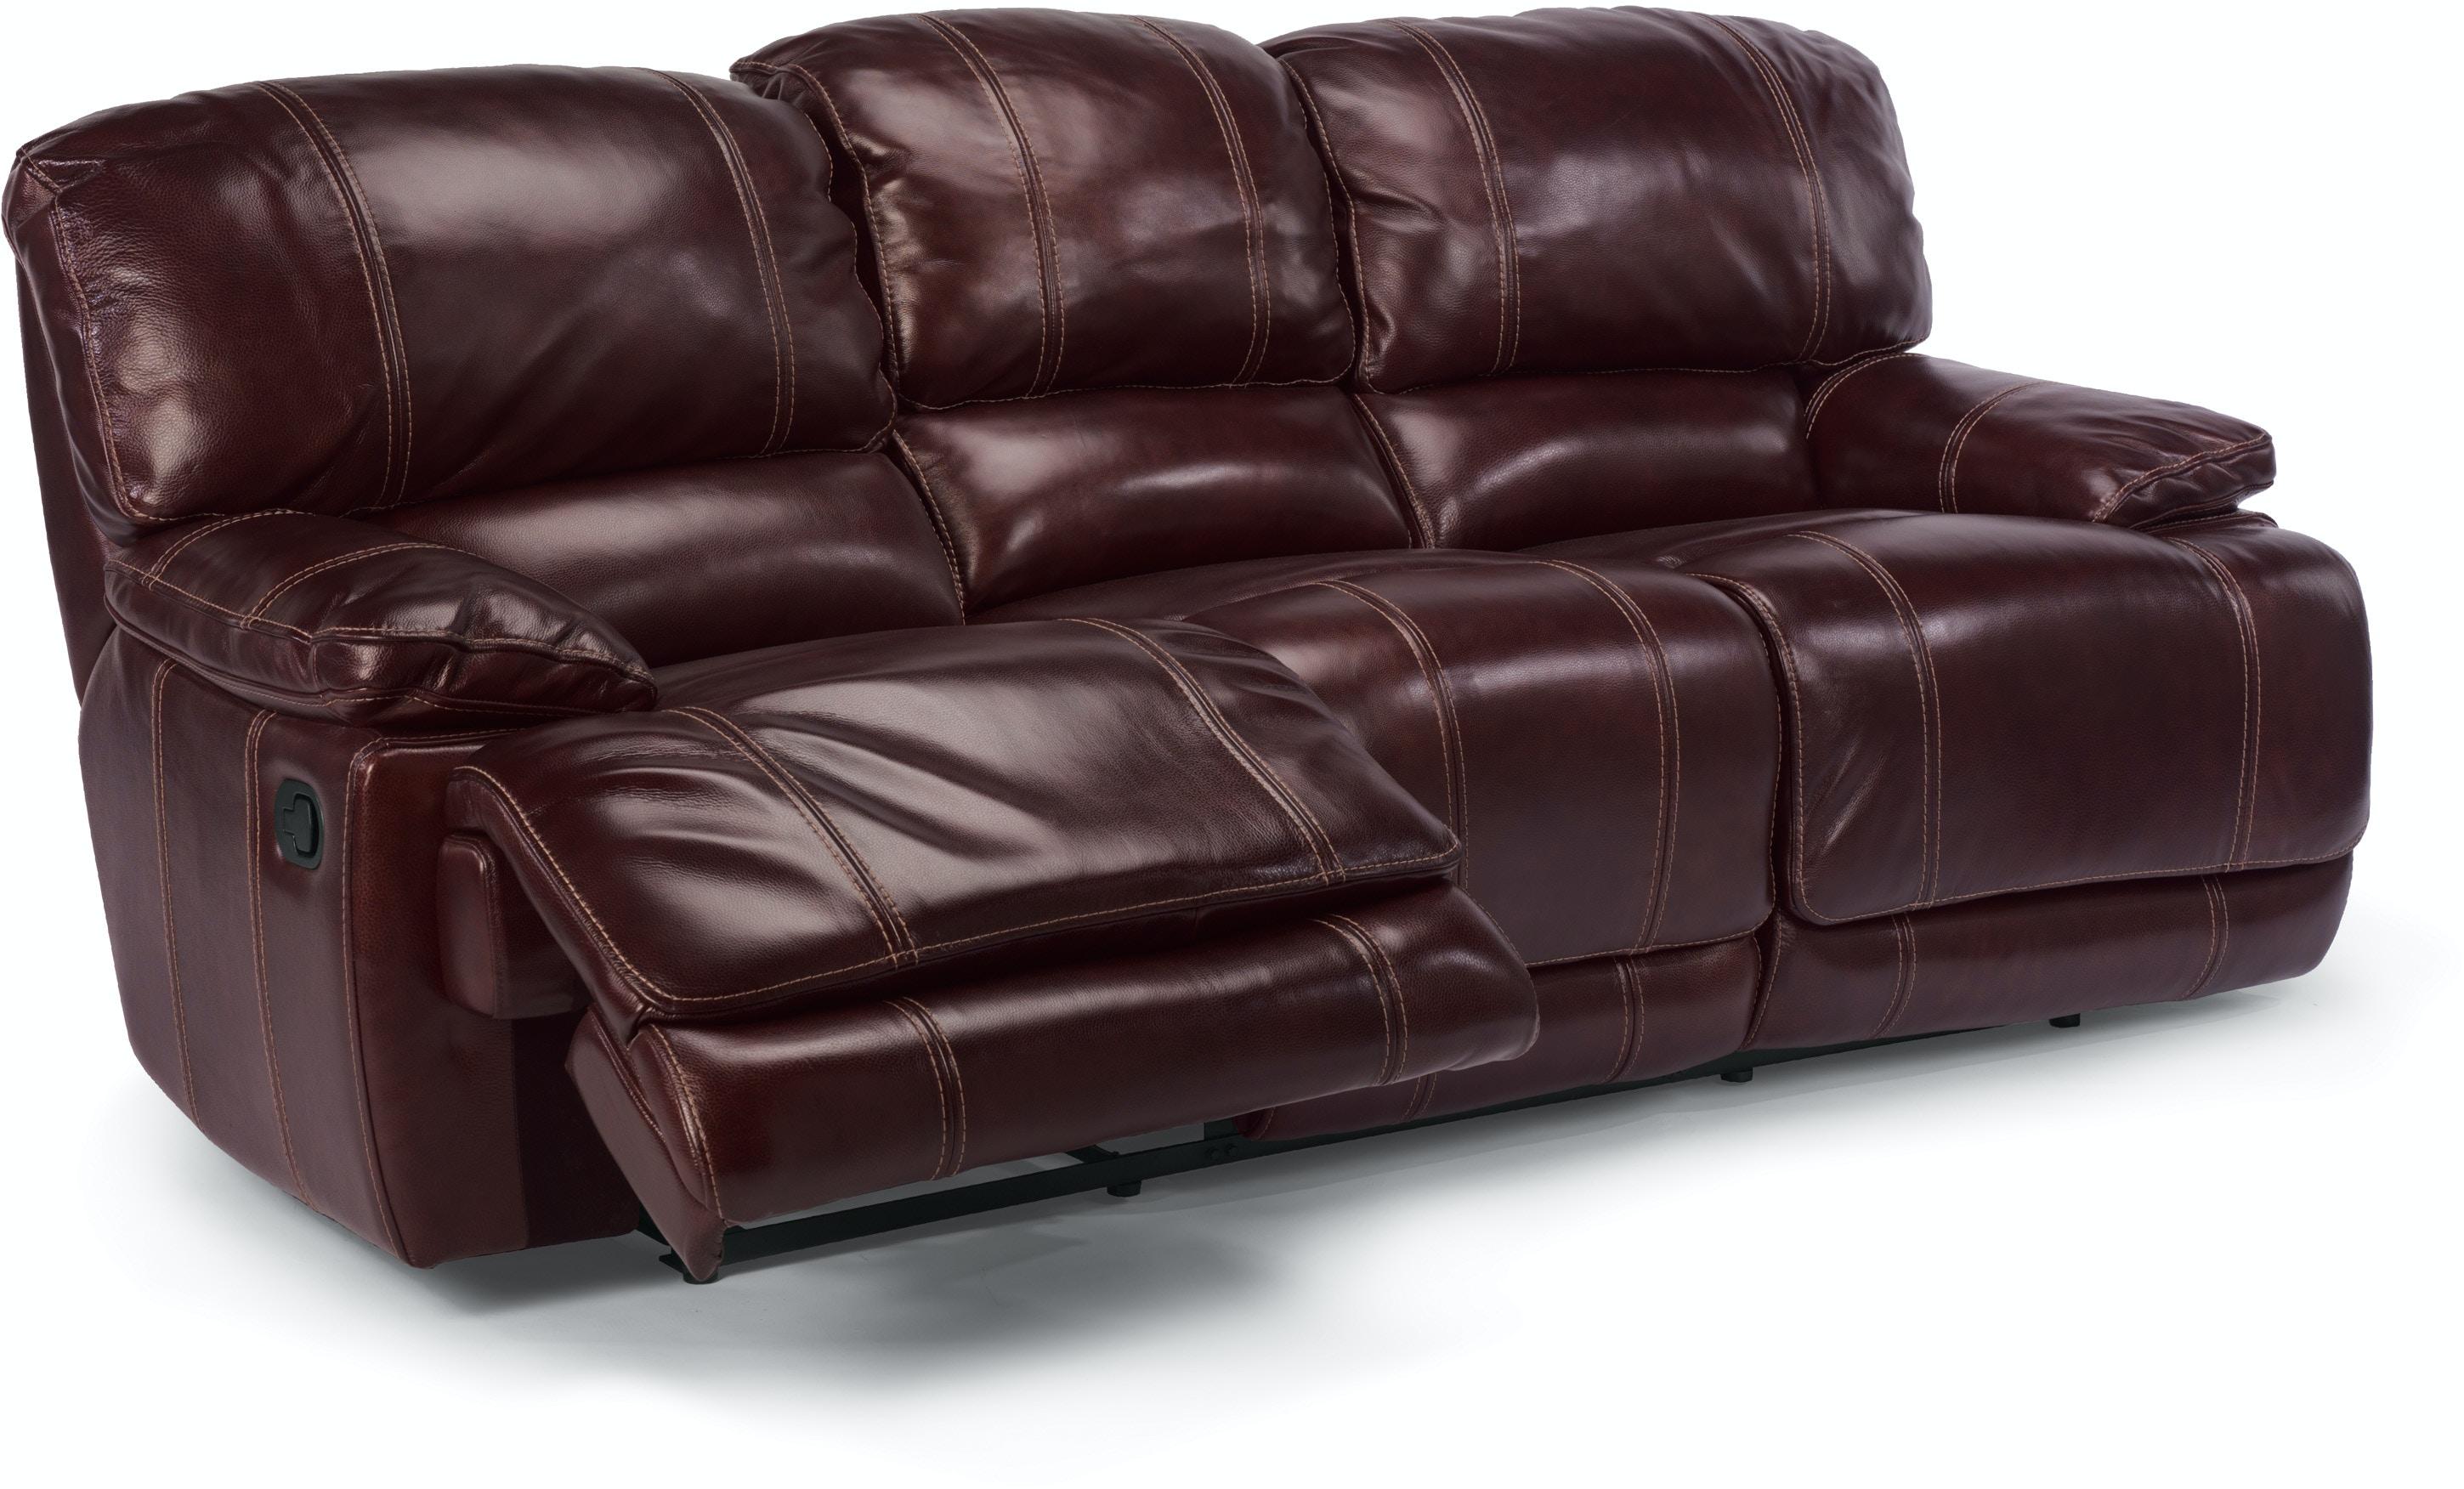 Flexsteel Furniture Woodchucks Fine Furniture Decor  ~ Sofa Bed Jacksonville Fl